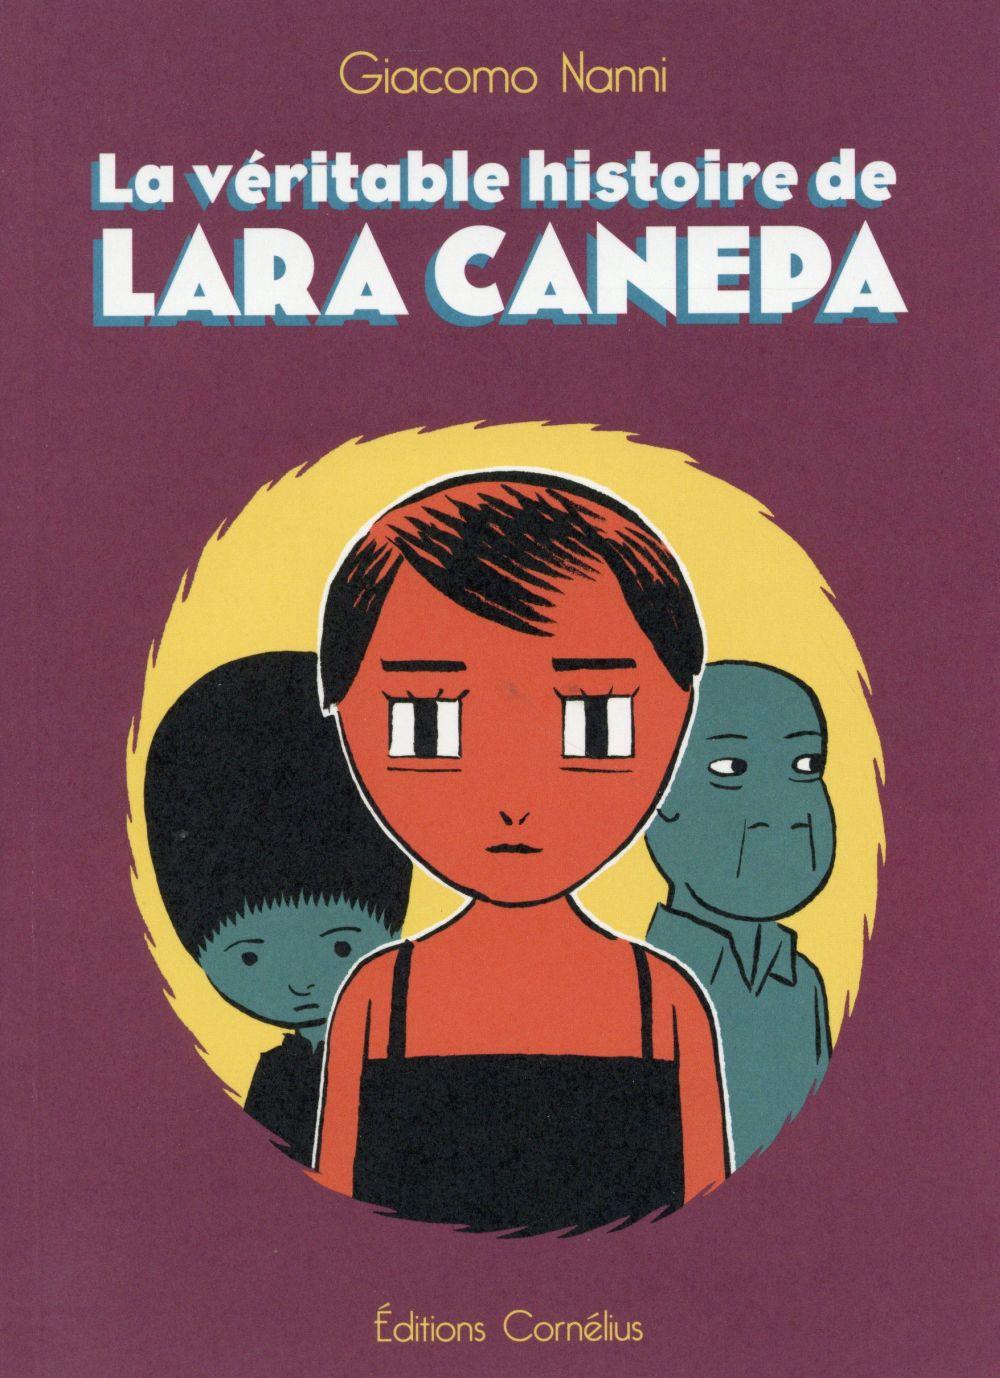 la véritable histoire de Lara Canepa